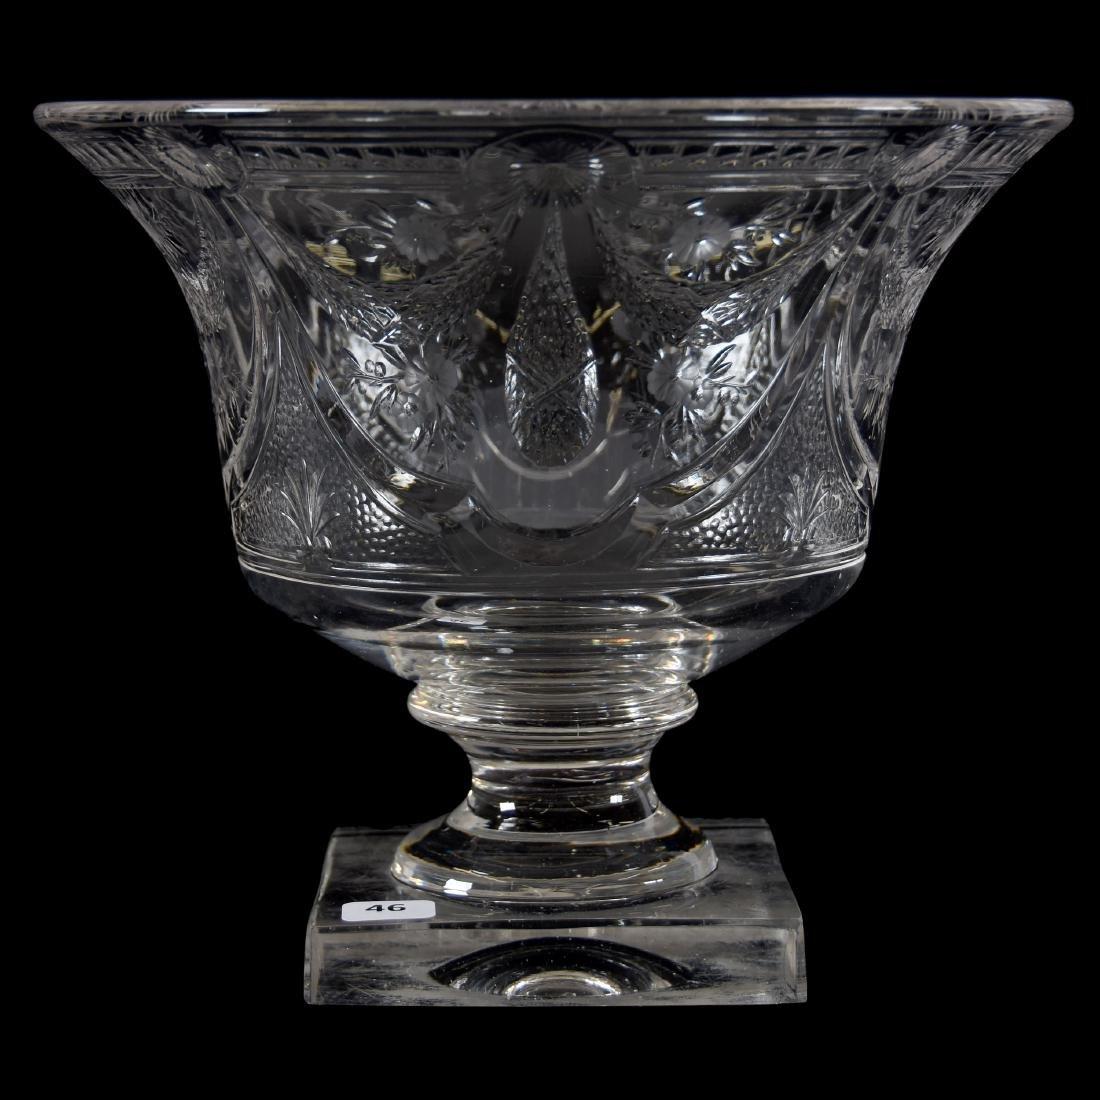 Pedestal Bowl, Engraved Garland & Floral Motif